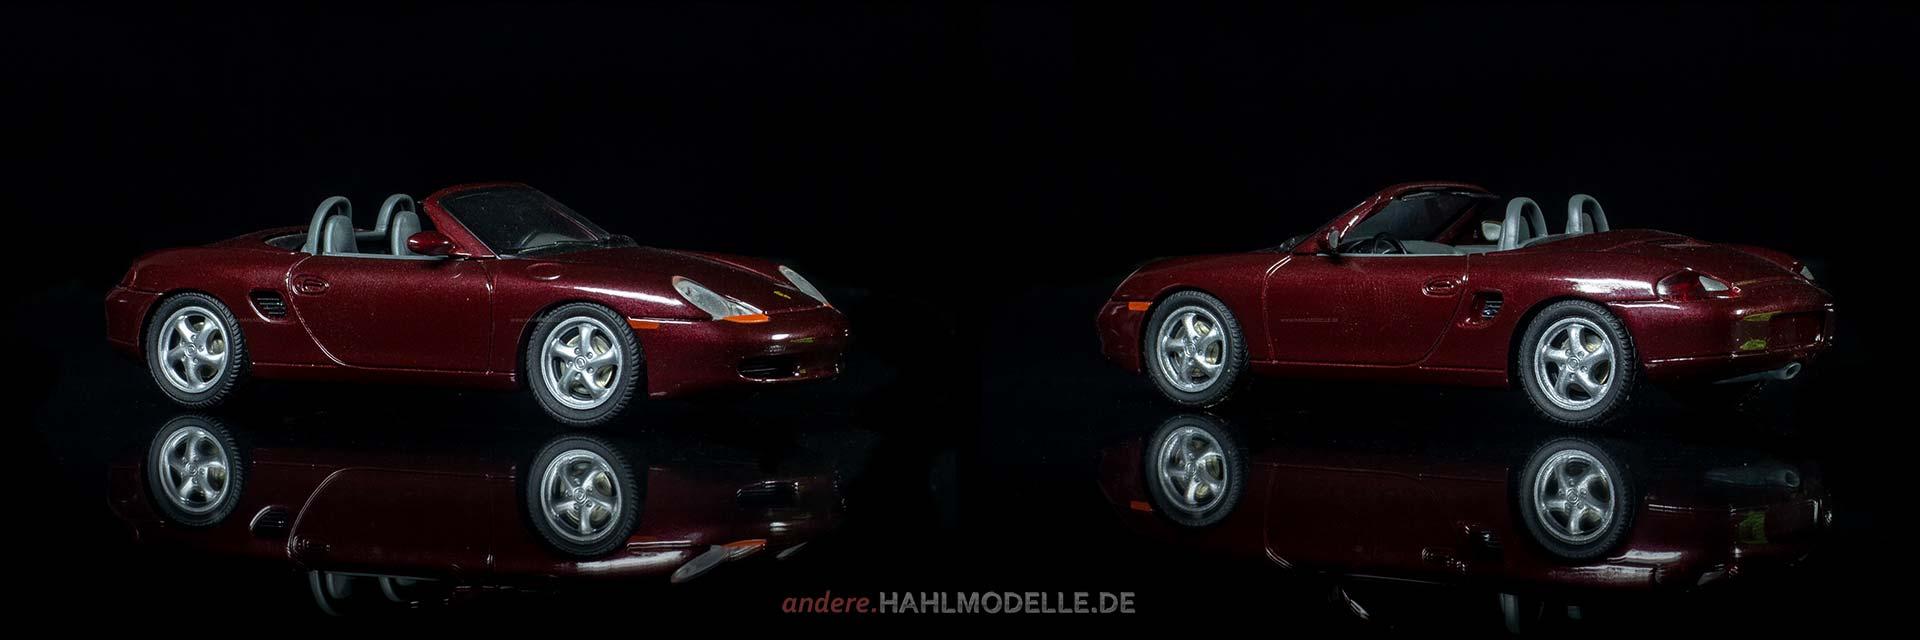 Porsche Boxter (Typ 986) | Roadster | Schucoo | 1:43 | www.andere.hahlmodelle.de